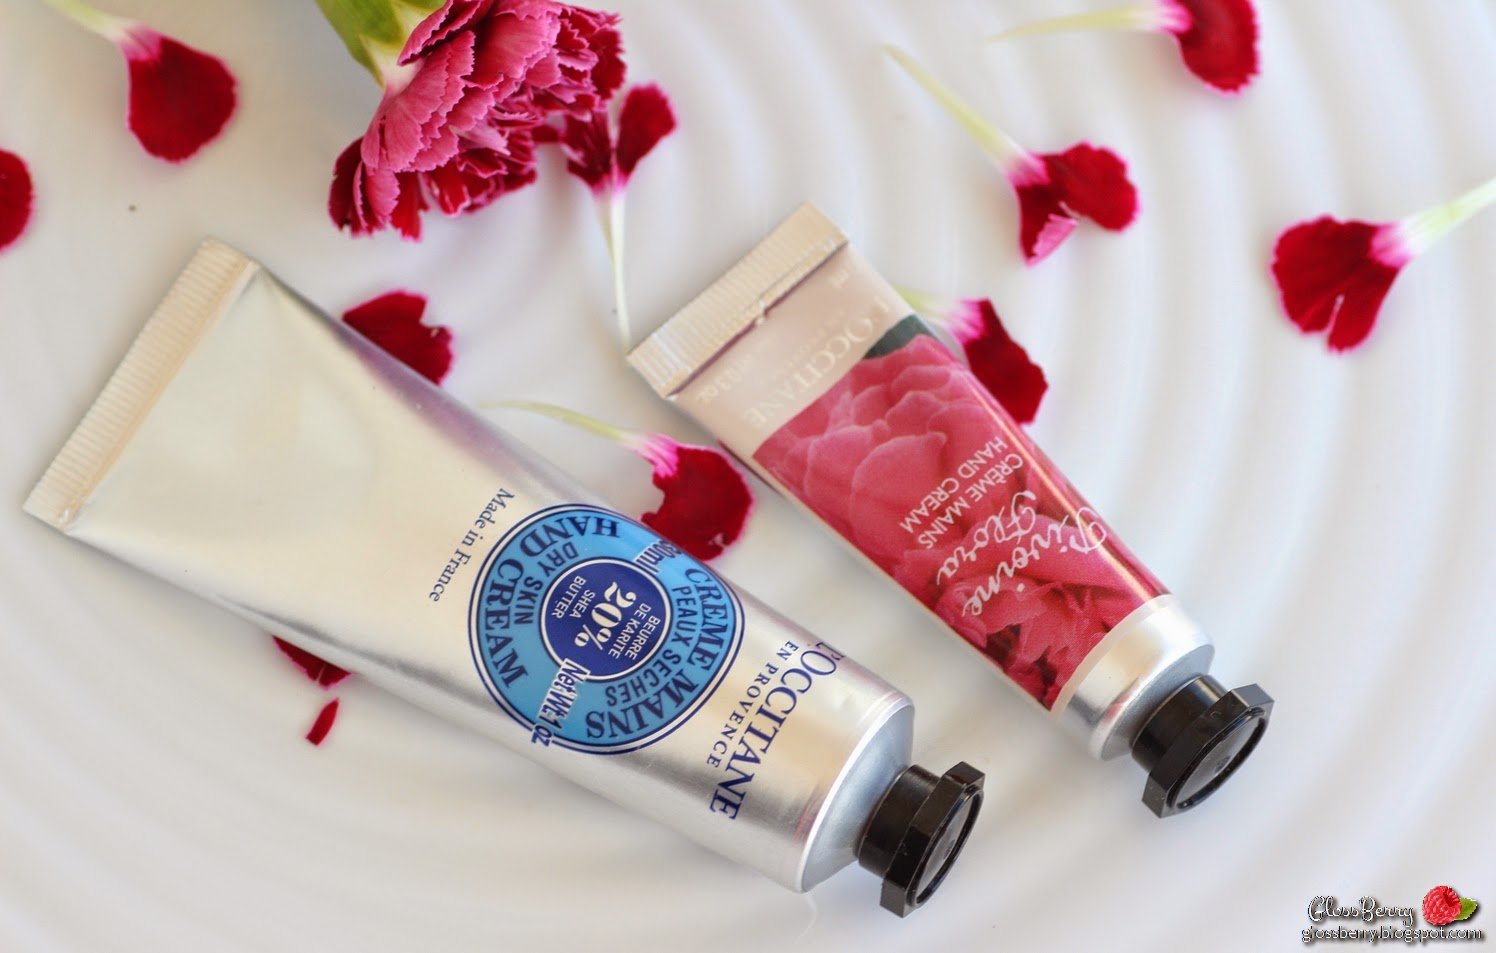 L'Occitane - Hand Cream קרם ידיים לוקסיטן ל'אוקסיטן המלצה פירות ריחות פרחים גלוסברי בלוג איפור וטיפוח glossberry beauty blog